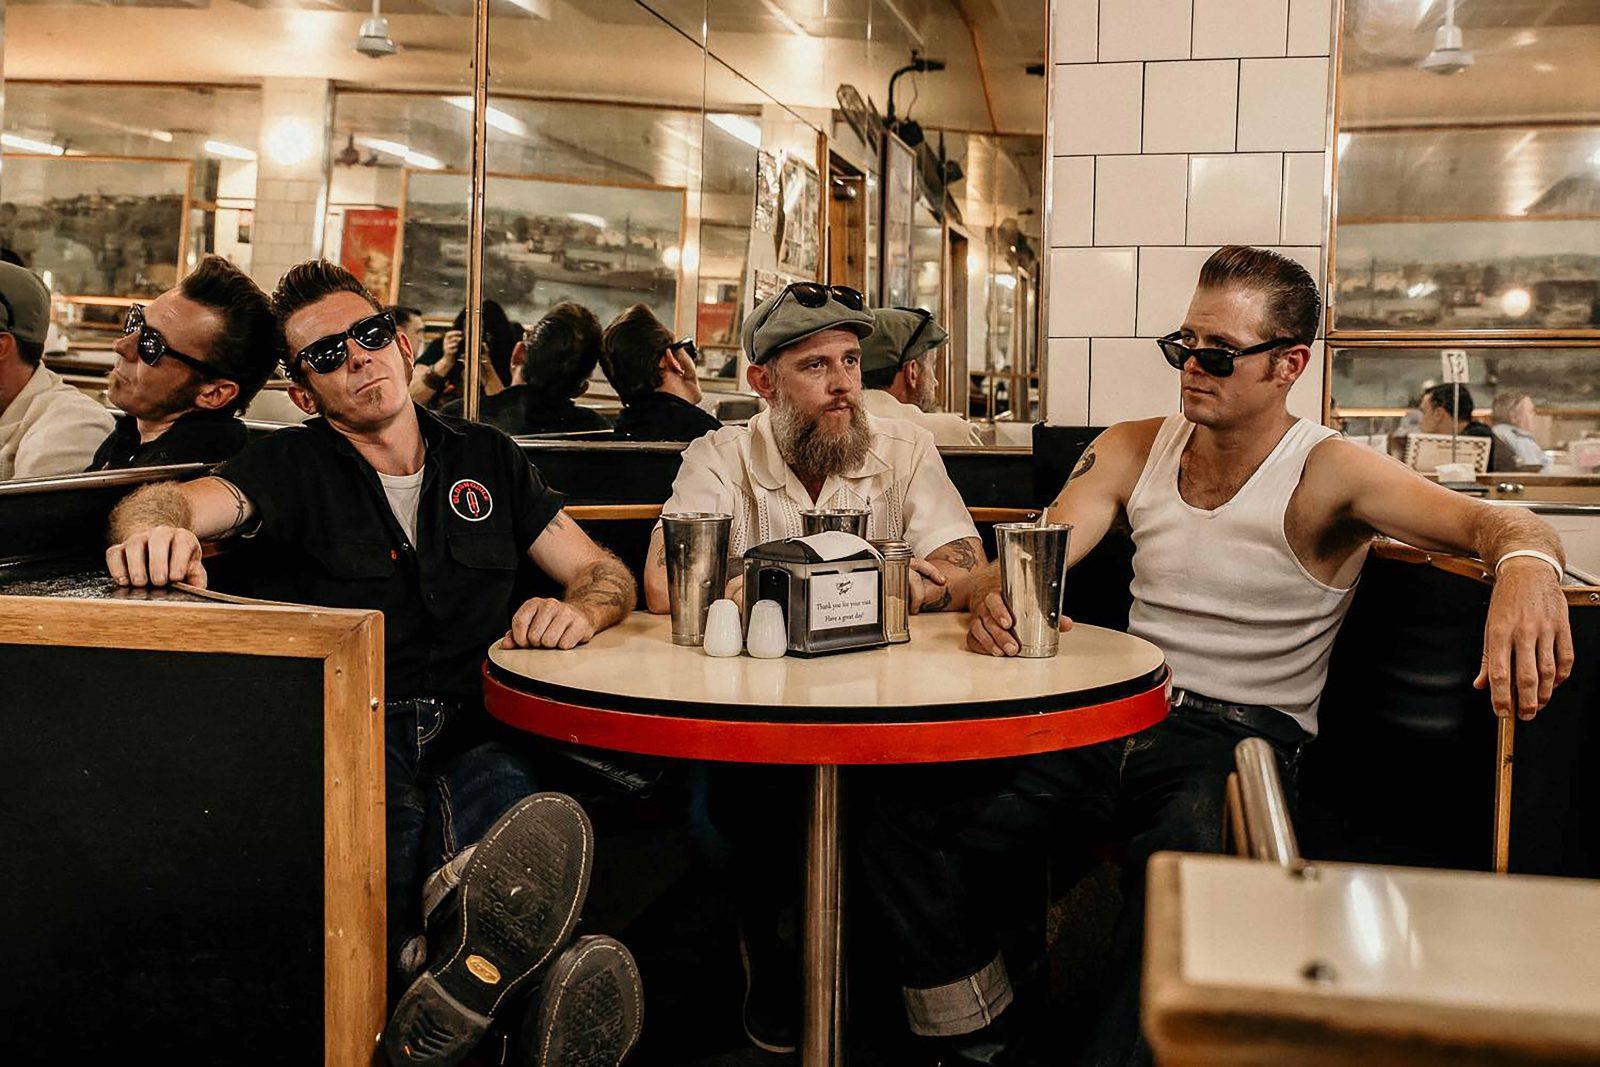 Three blokes in a vintage Milk Bar Diner